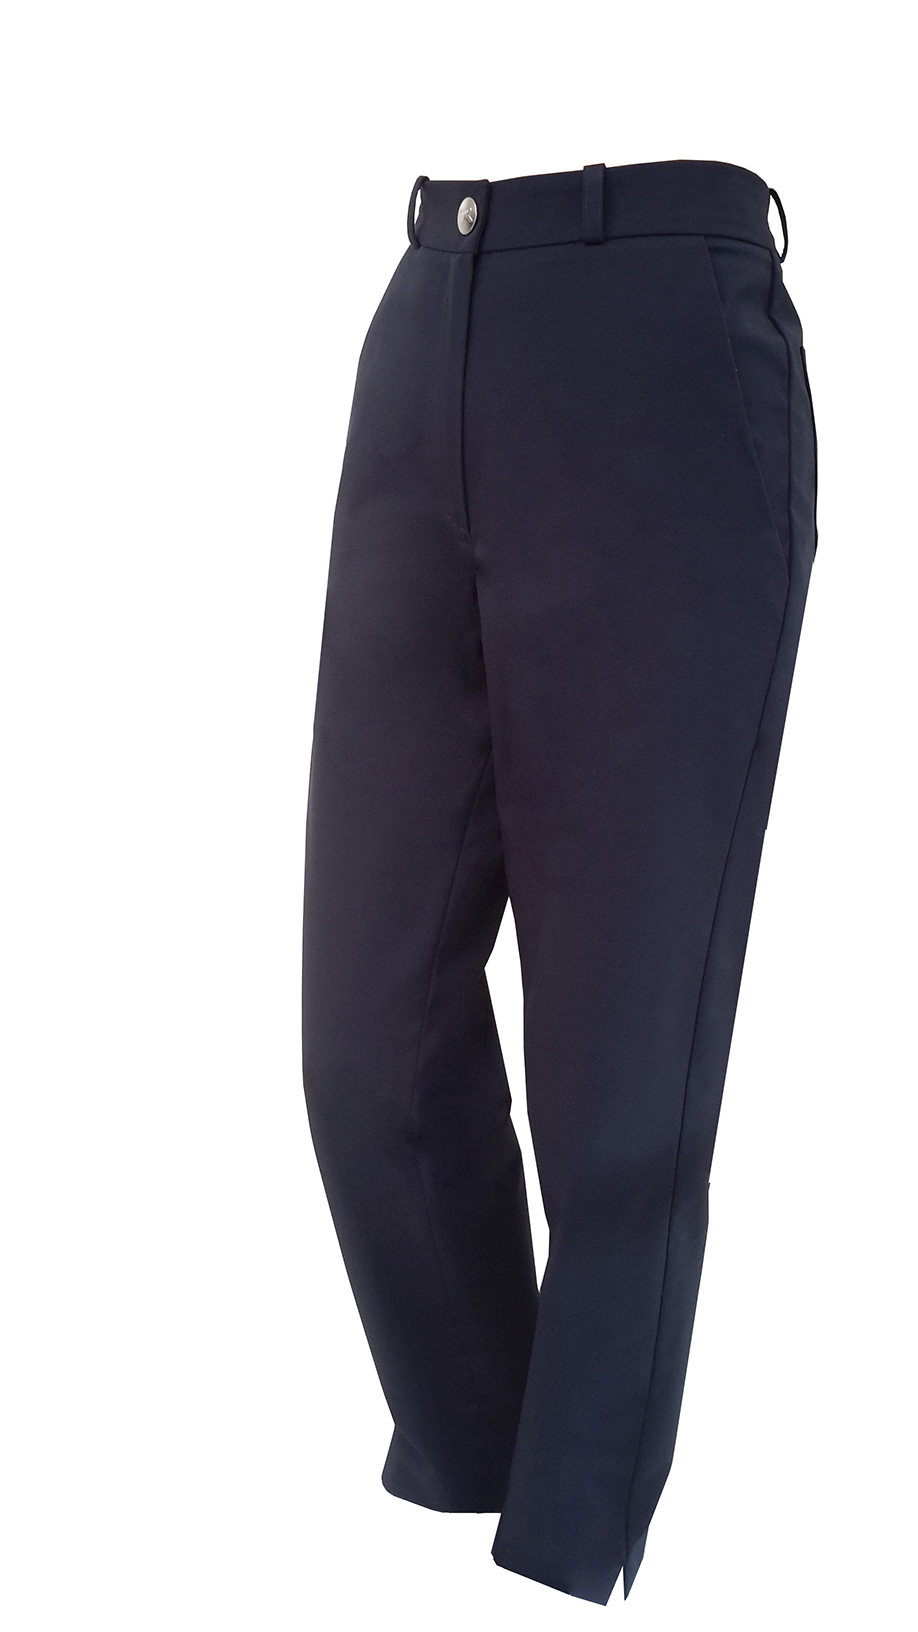 Pantalonmarine